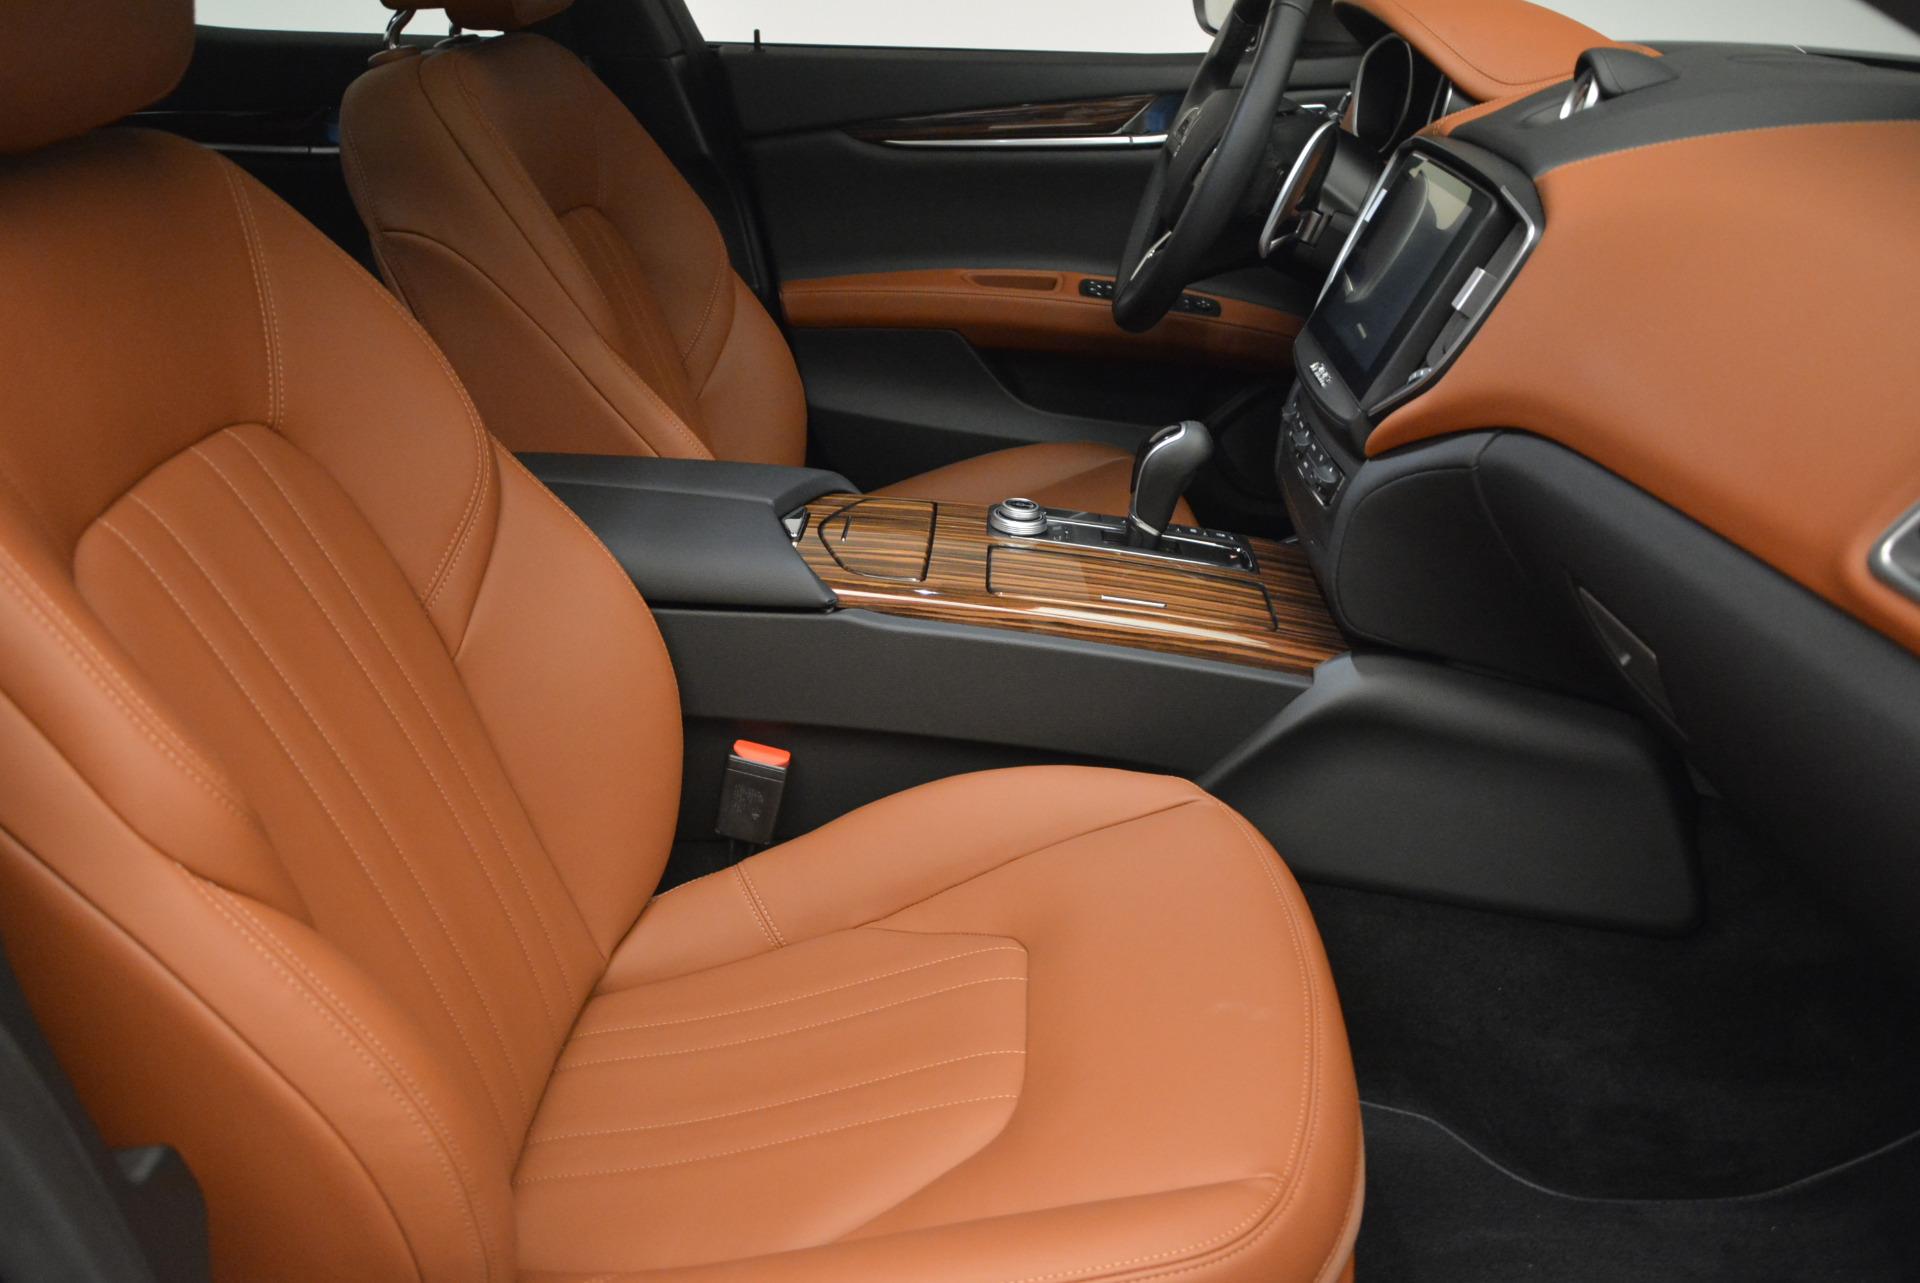 Used 2017 Maserati Ghibli S Q4 - EX Loaner For Sale In Greenwich, CT. Alfa Romeo of Greenwich, M1662 568_p20